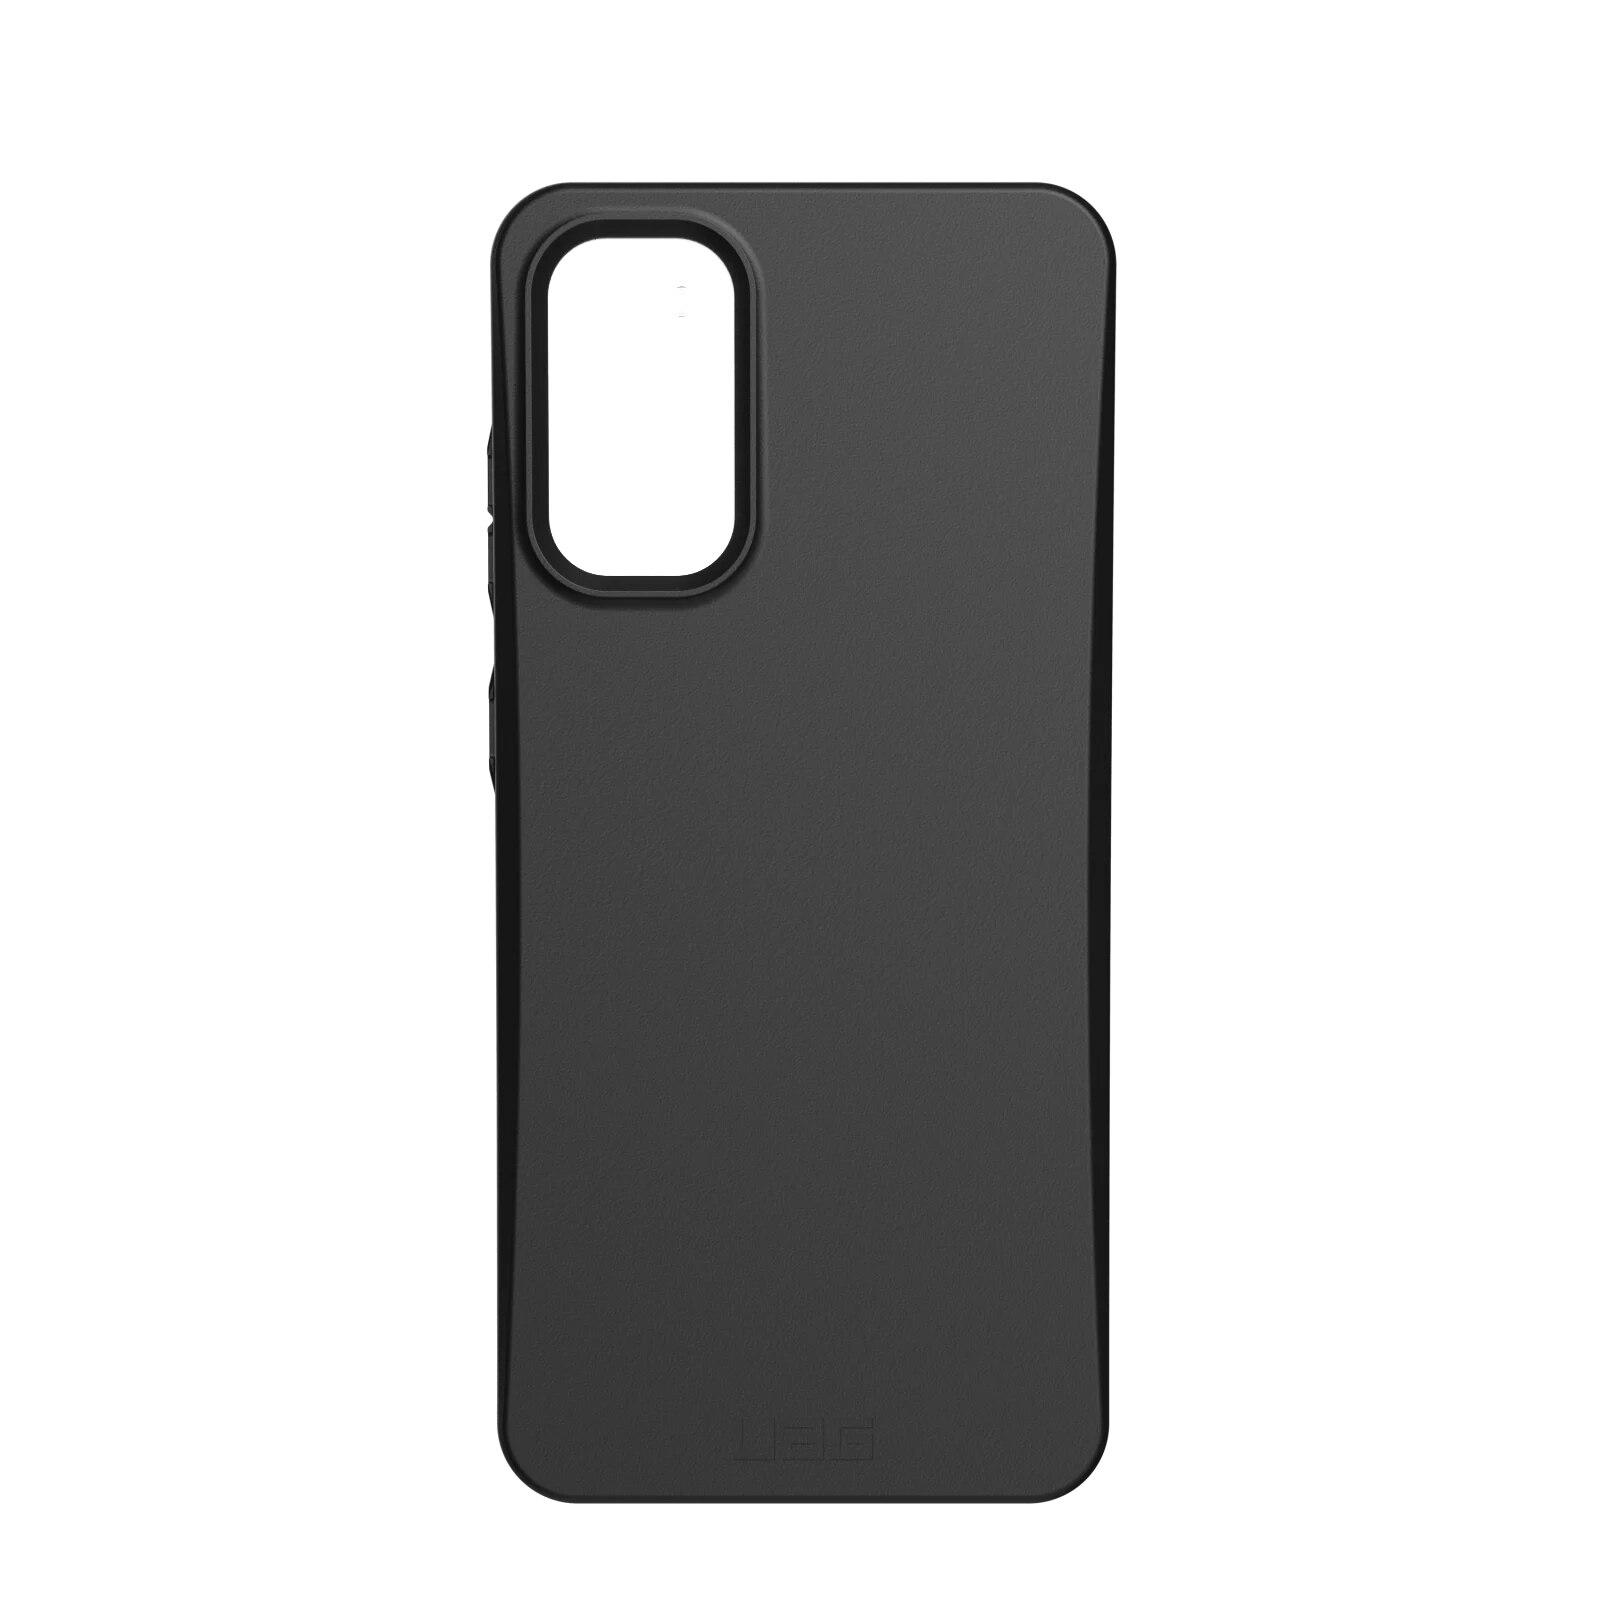 Fotografie Husa de protectie biodegradabila Outback Samsung Galaxy S20, Black